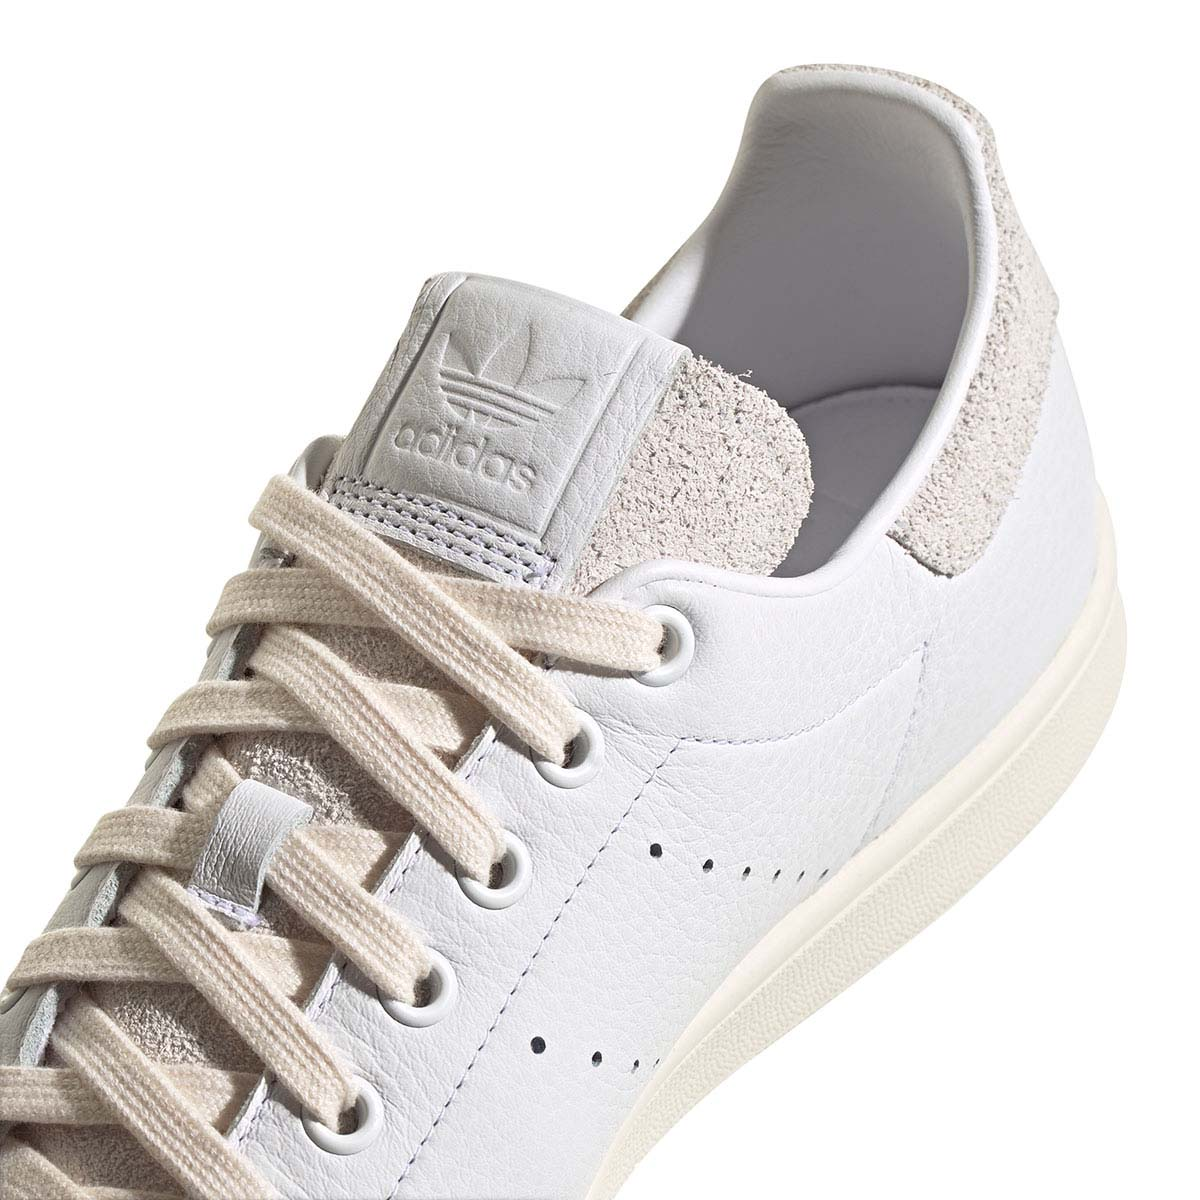 adidas STAN SMITH FOOTWEAR WHITE / CRYSTAL WHITE / OFF WHITE FY0040 アディダス スタンスミス ホワイト/オフホワイト